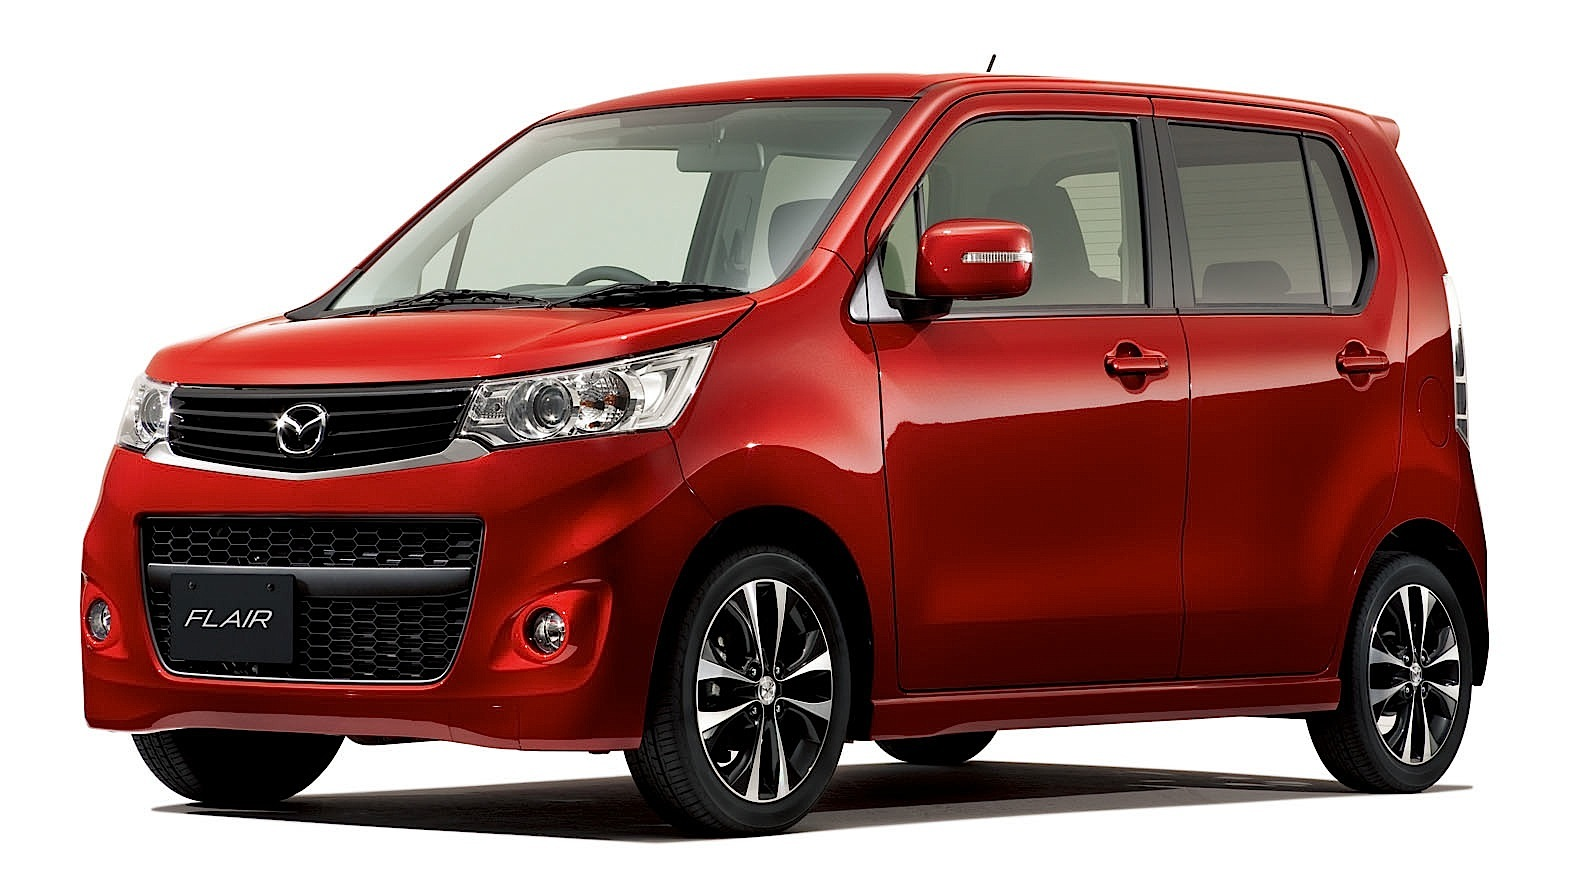 Mazda Flair I 2012 - 2014 Microvan #8